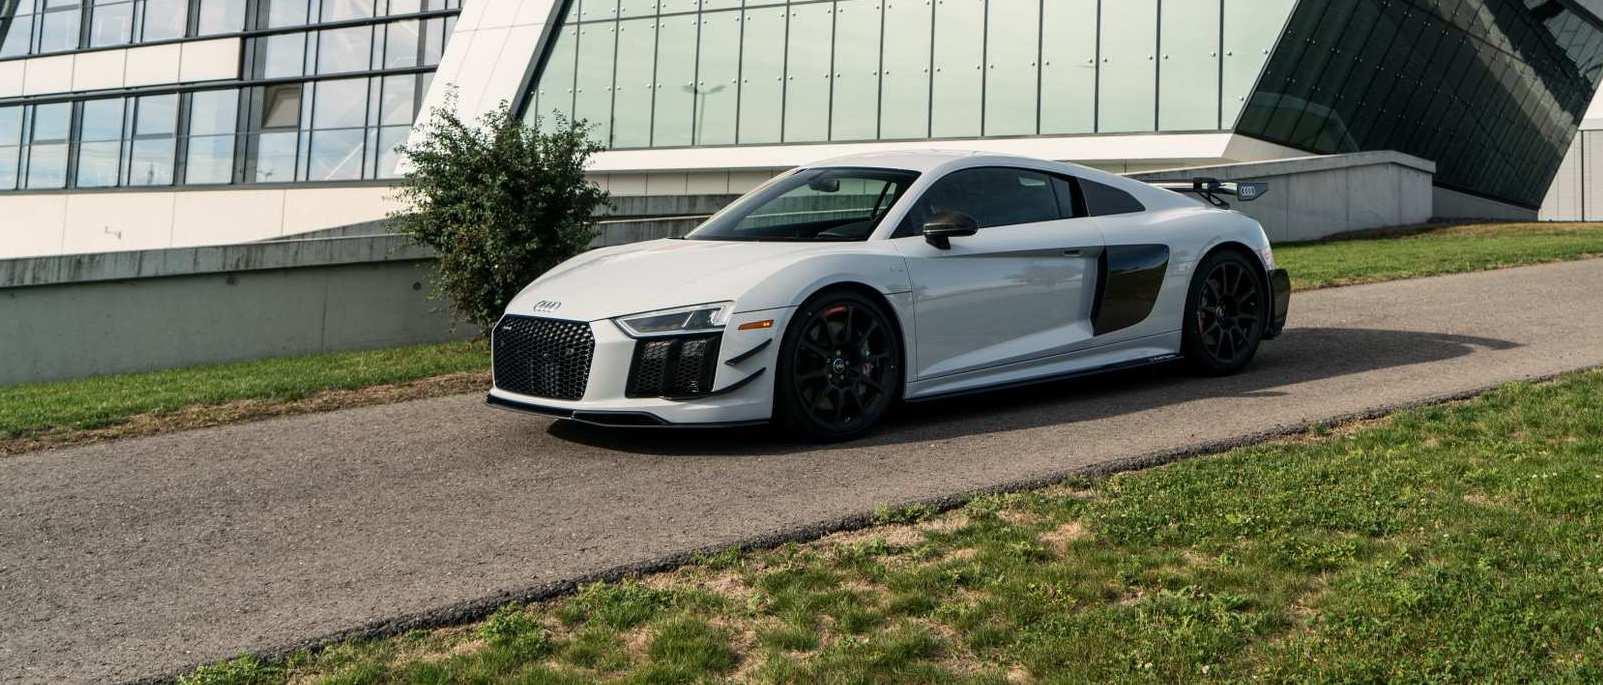 Audi ArchivesLes Voitures R8 Voitures R8 ArchivesLes Audi ArchivesLes ArchivesLes Audi Audi R8 Voitures R8 gb7vYf6y